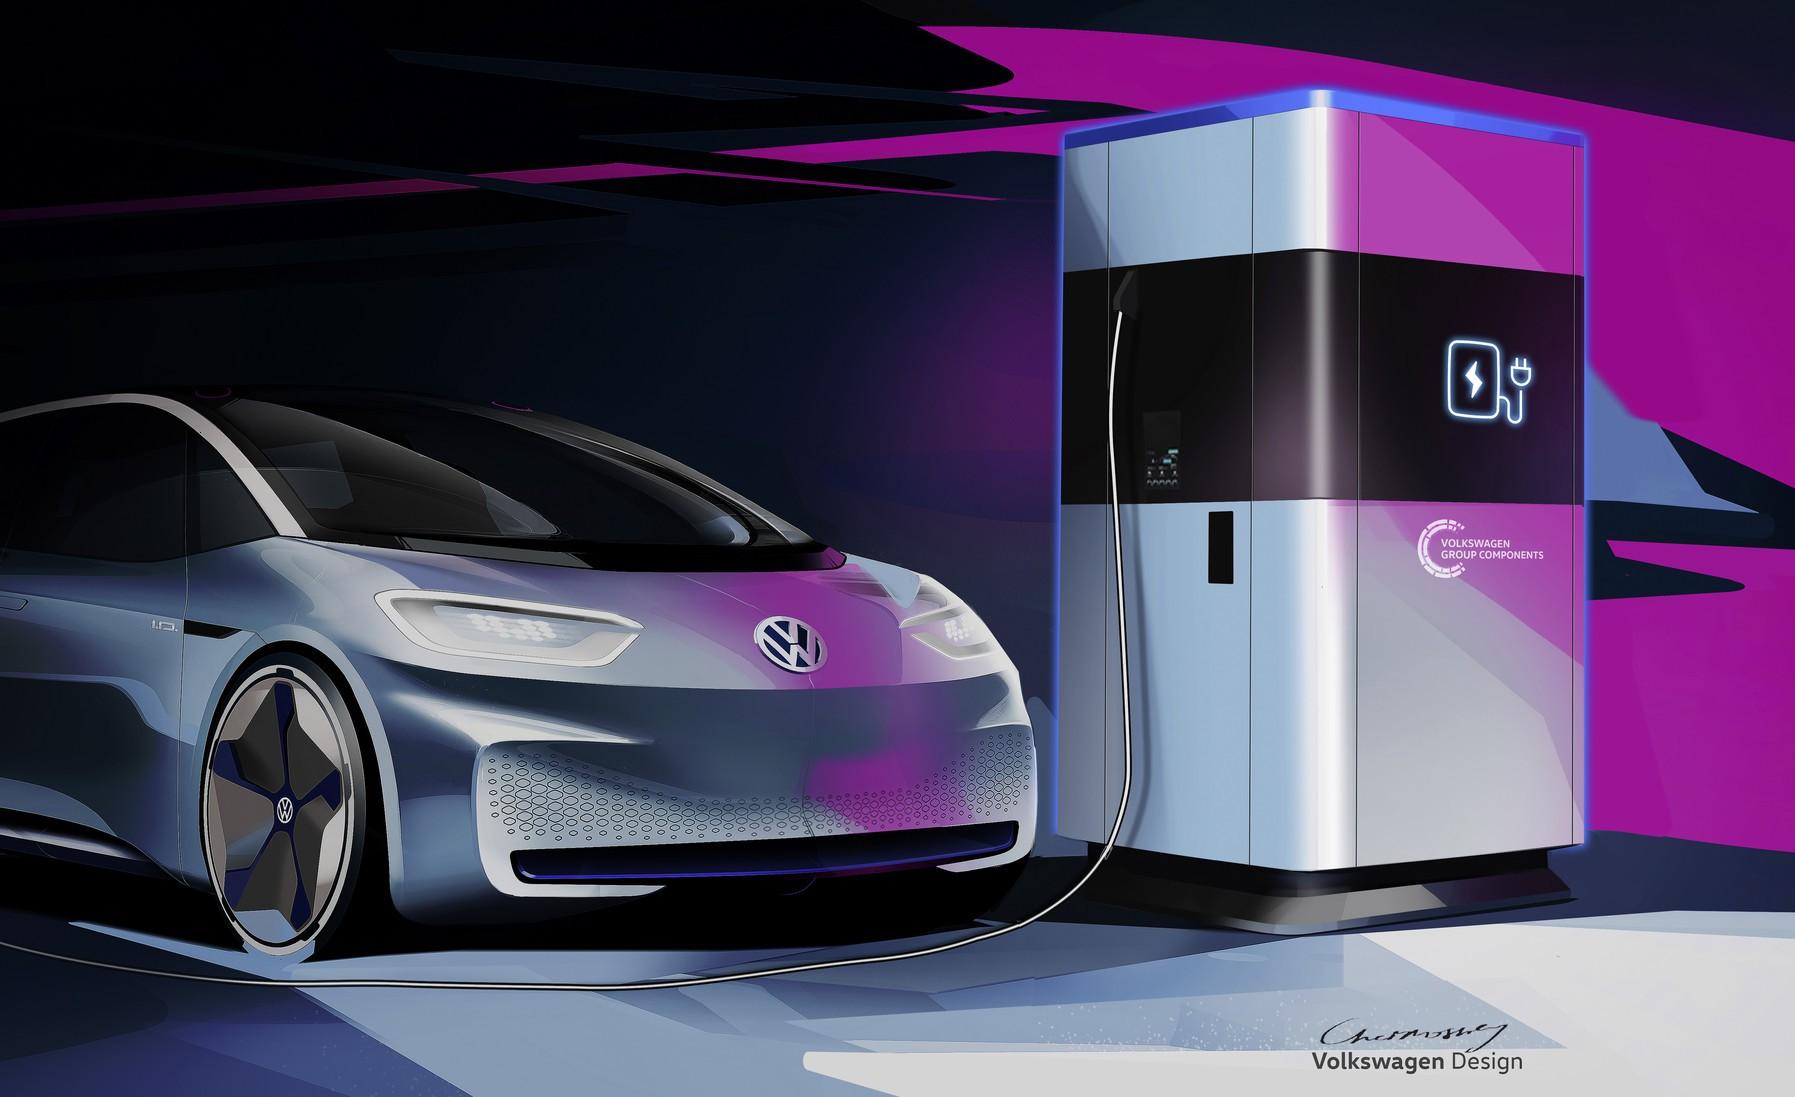 Volkswagen: Riesige Powerbank lädt Elektroautos -